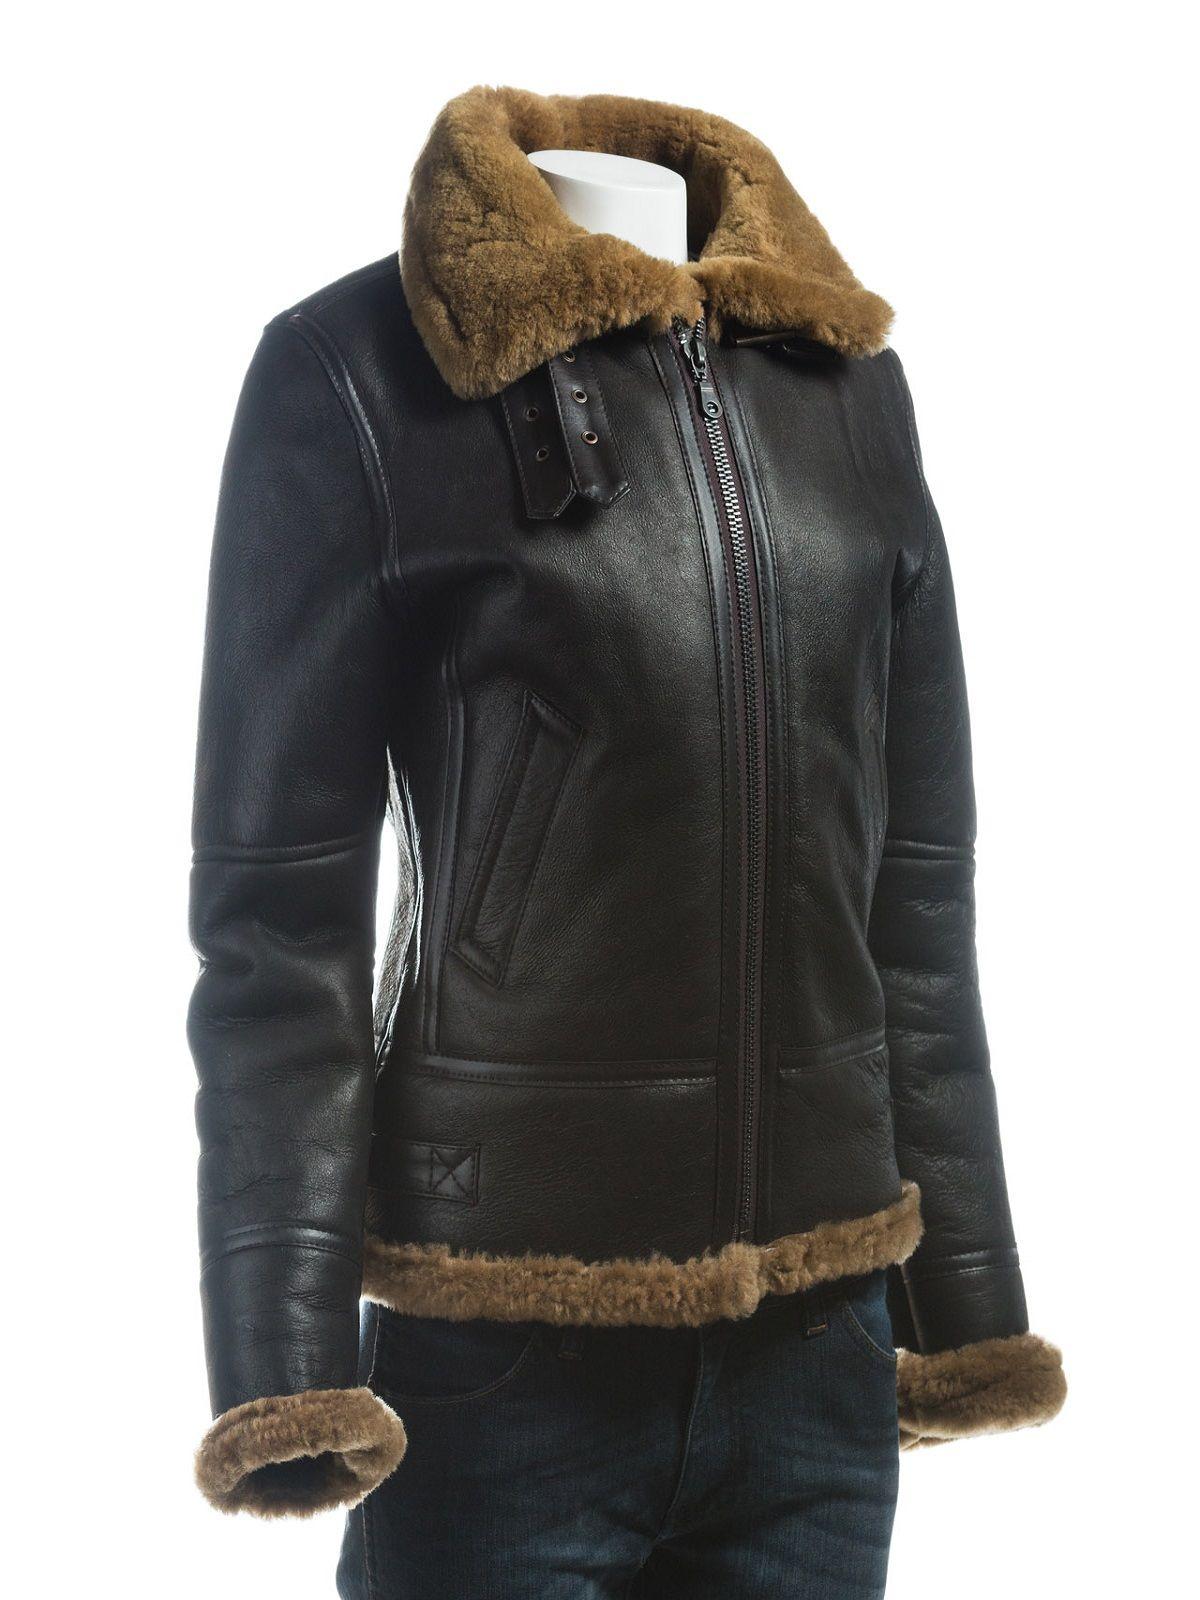 Women B3 Bomber Black Leather Jacket Women Jacket Mauvetree Leather Jackets Women Womens Black Leather Jacket Black Leather Jacket [ 1600 x 1200 Pixel ]